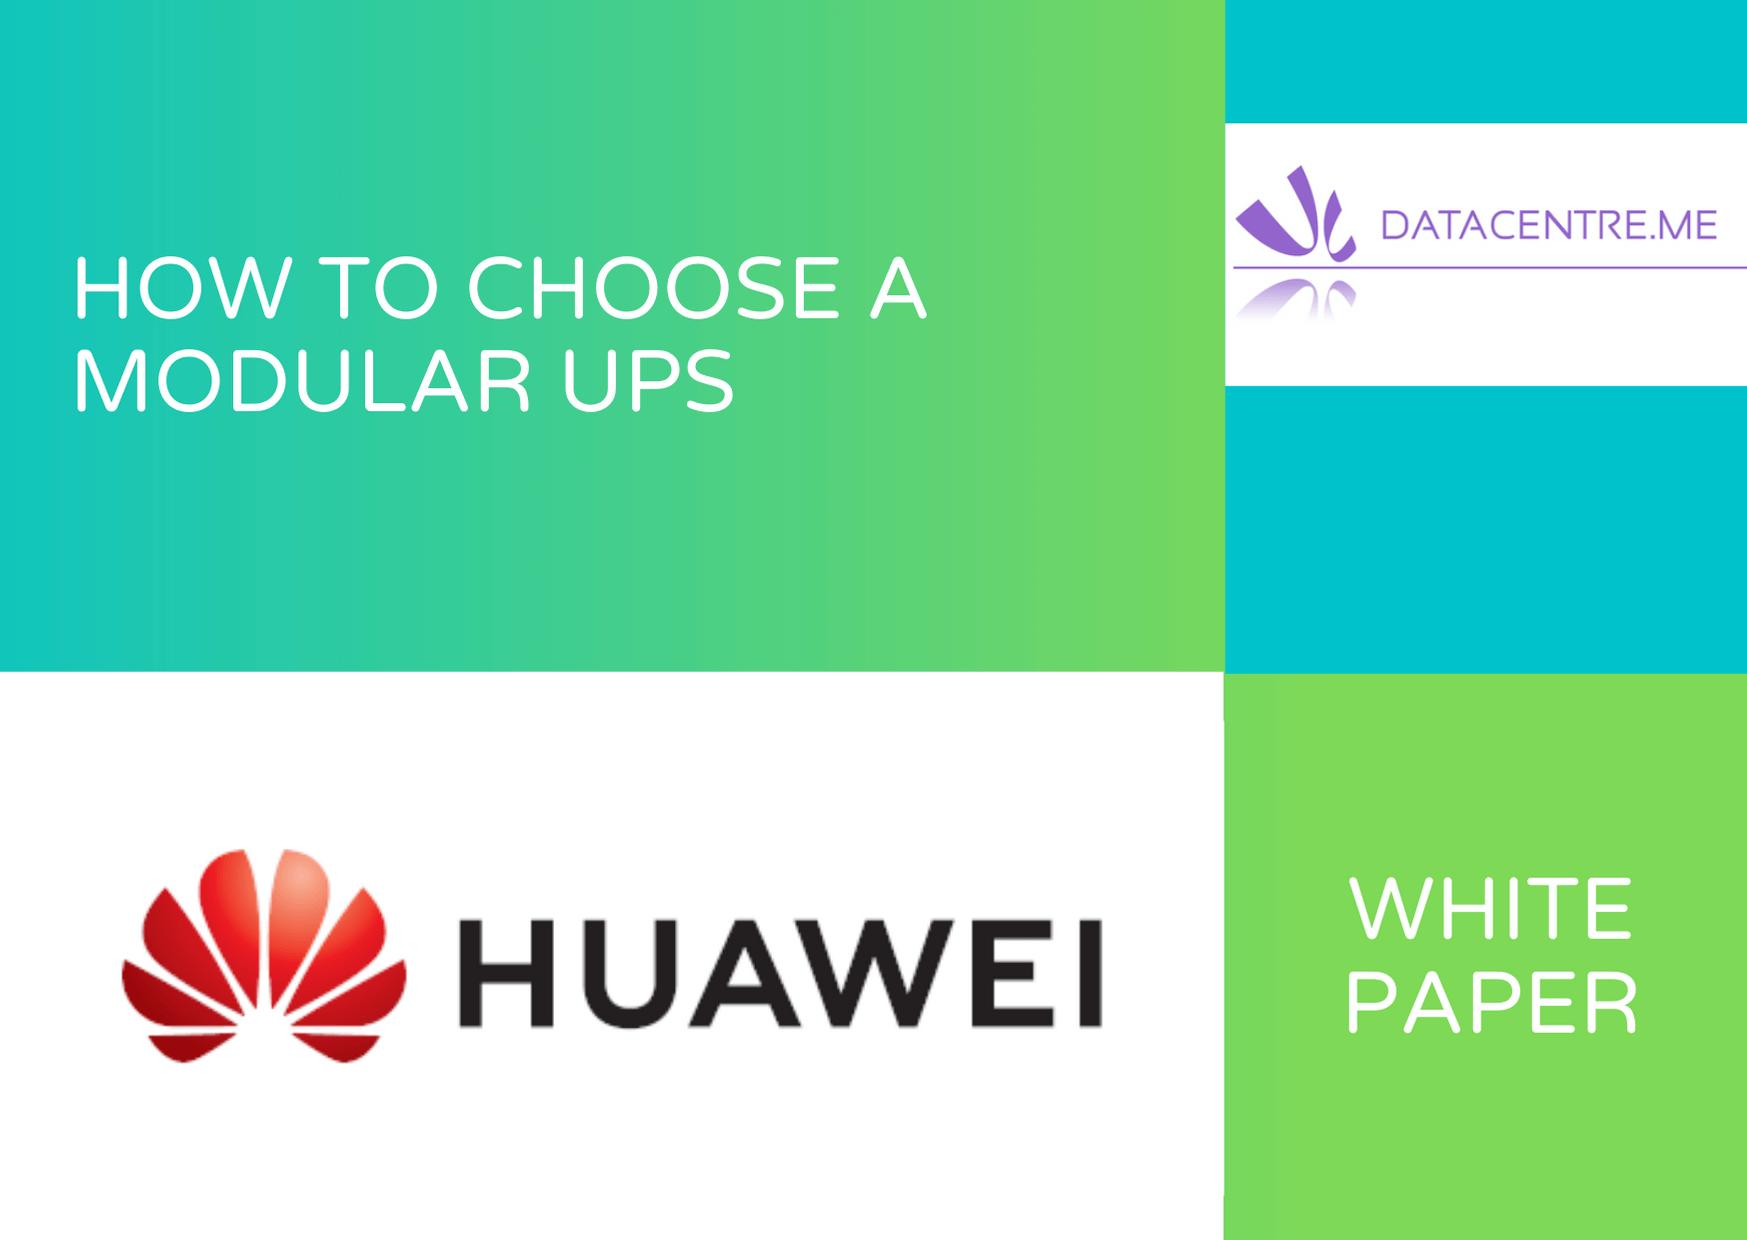 Huawei White Paper 2 How to choose a modular UPS